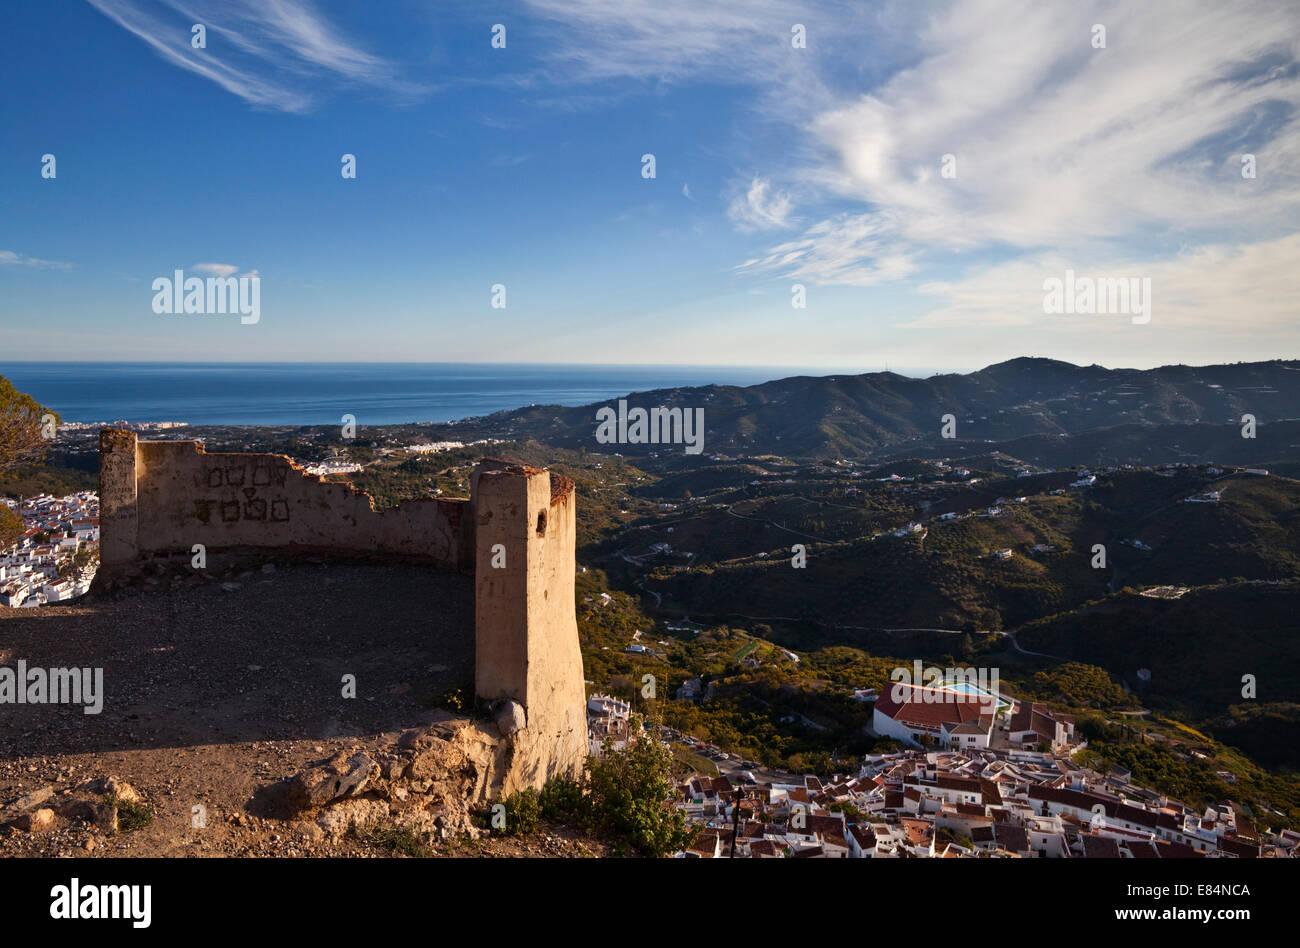 Frigiliana from  El Fuerte de Frigiliana, and distant Nerja, Costa del Sol, Malaga Province, Andalucoa, Spain - Stock Image